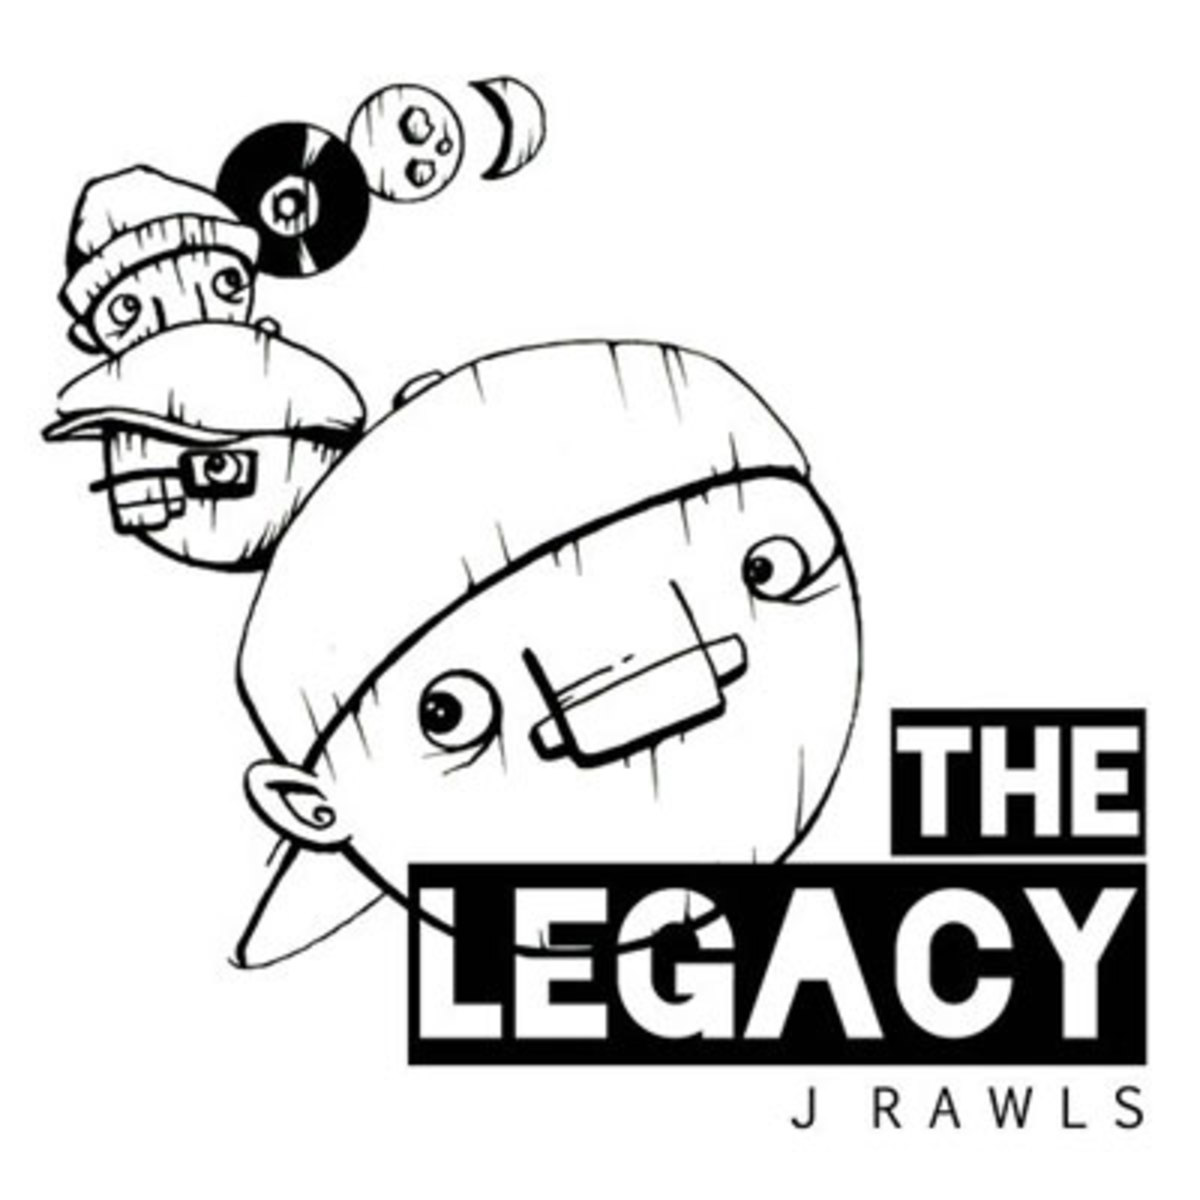 jrawls-thelegacy.jpg